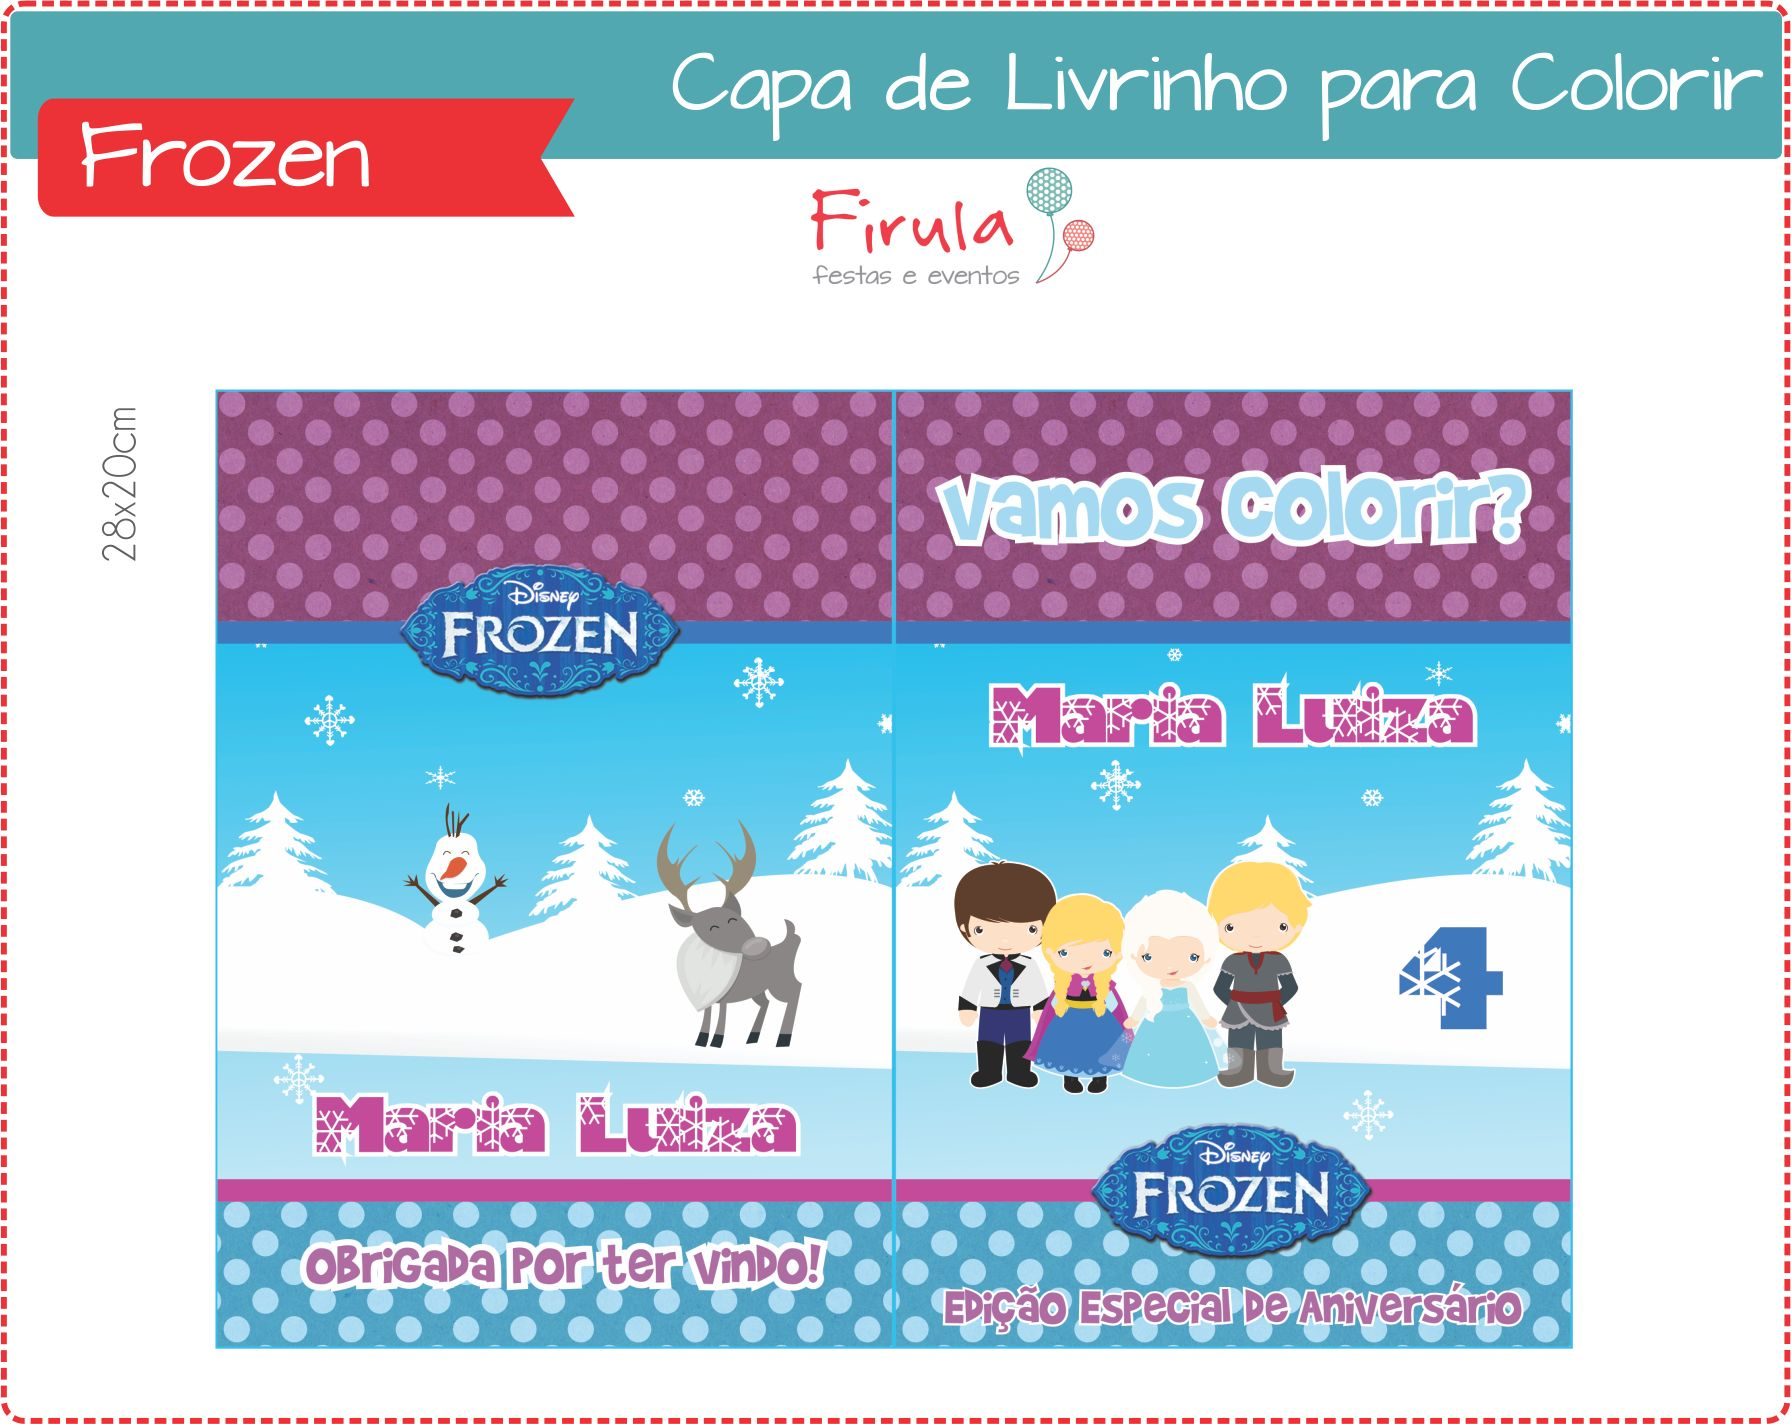 Capa De Livrinho Para Colorir Frozen No Elo7 Firula Festas 408a78